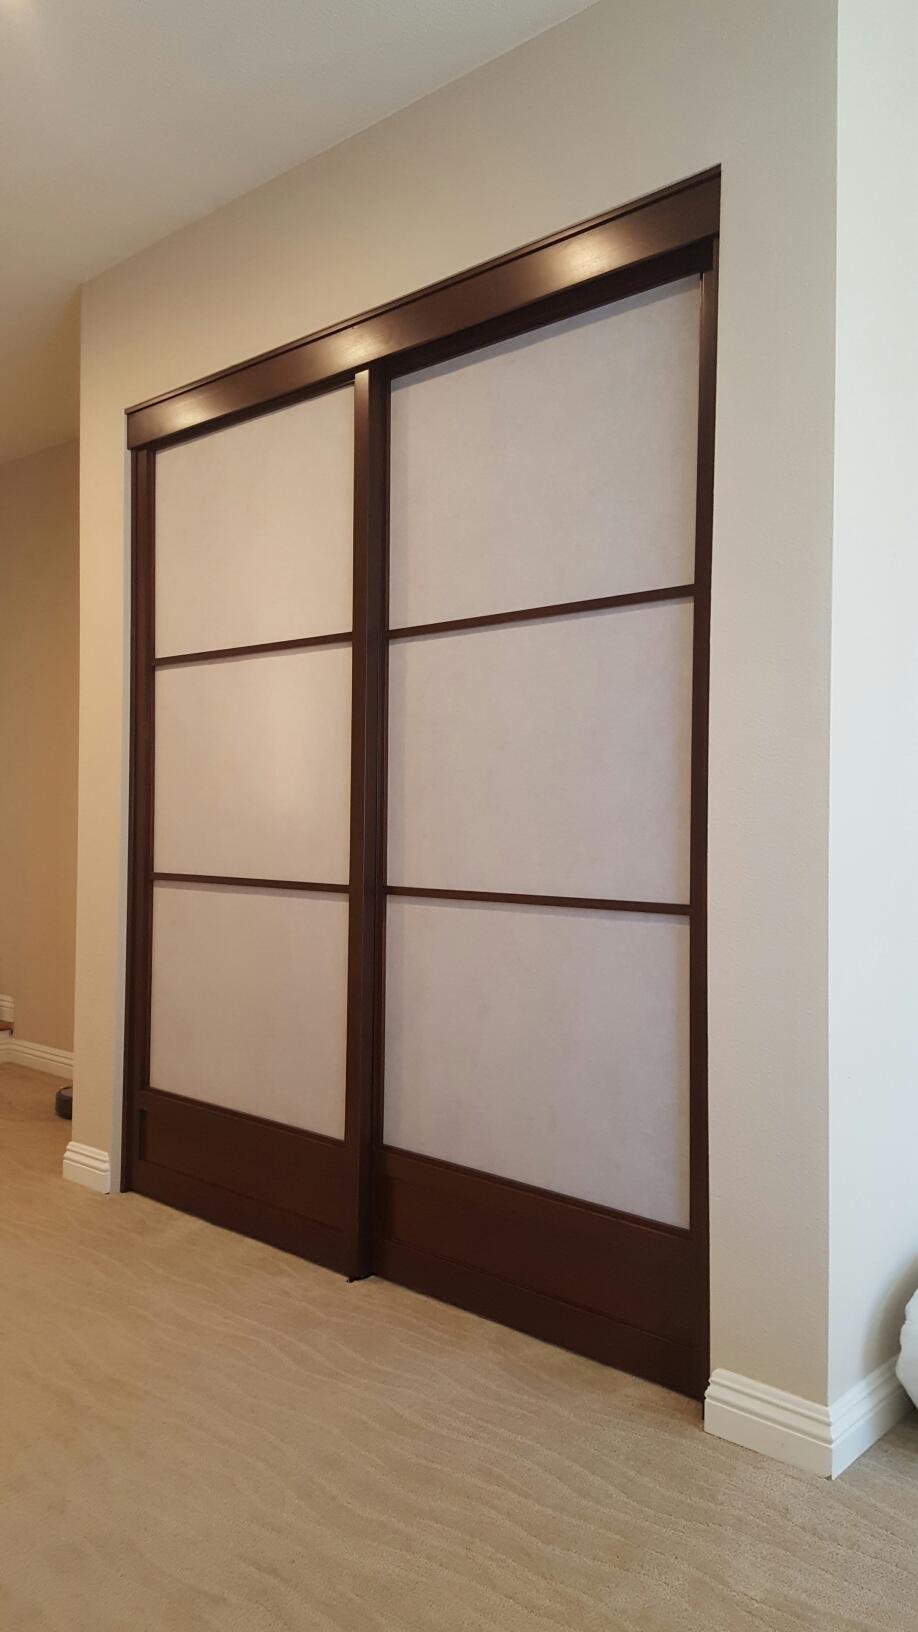 Merveilleux Interior Doors And Closets